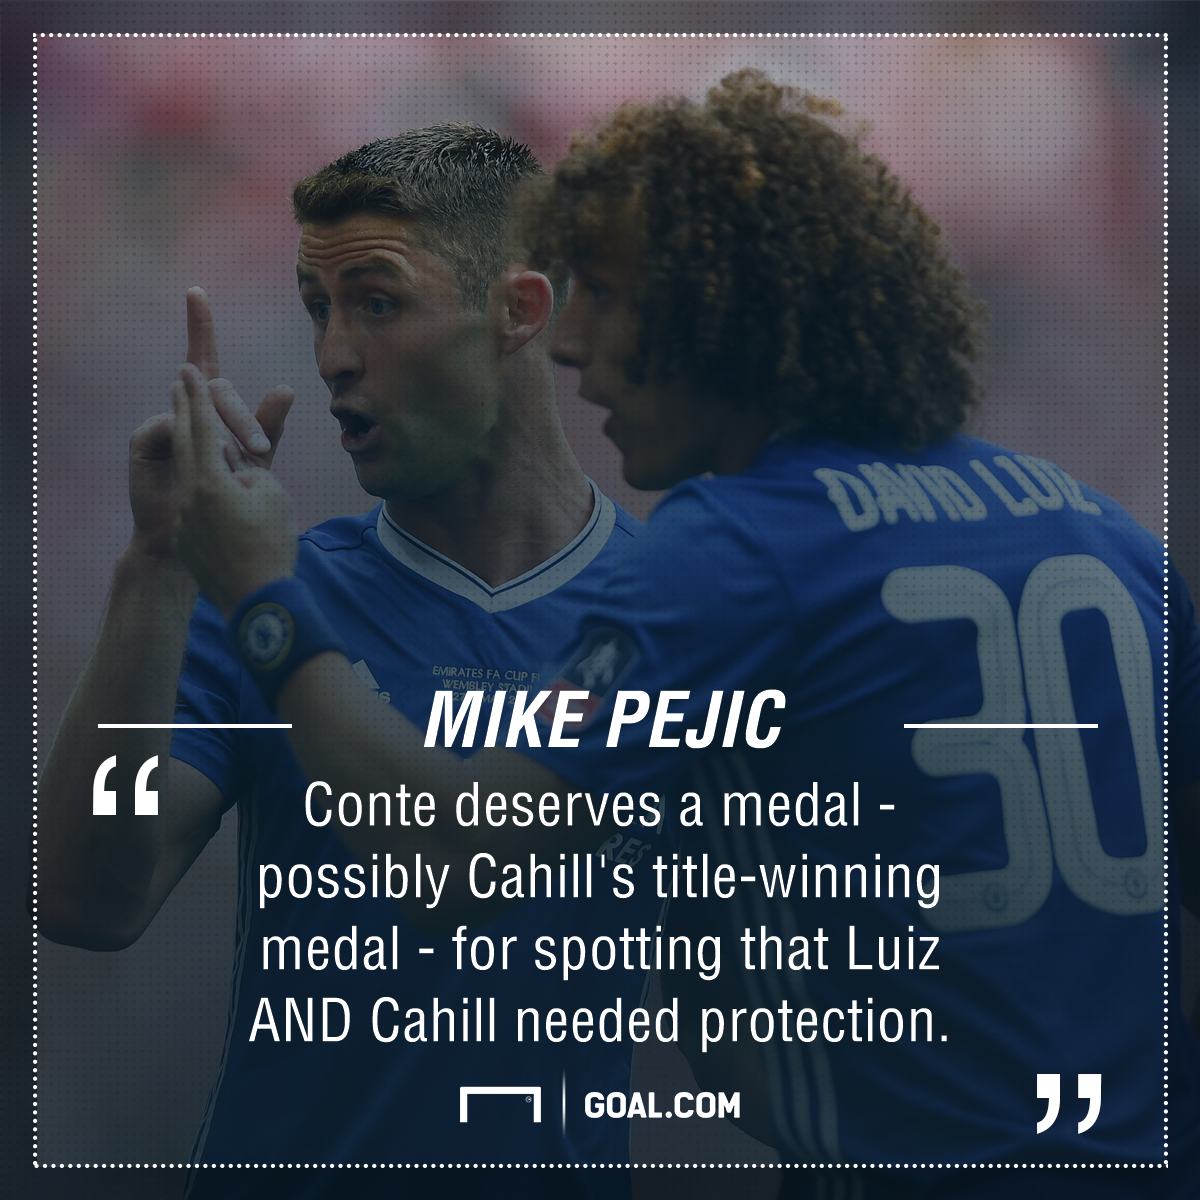 Gary Cahill David Luiz Mike Pejic